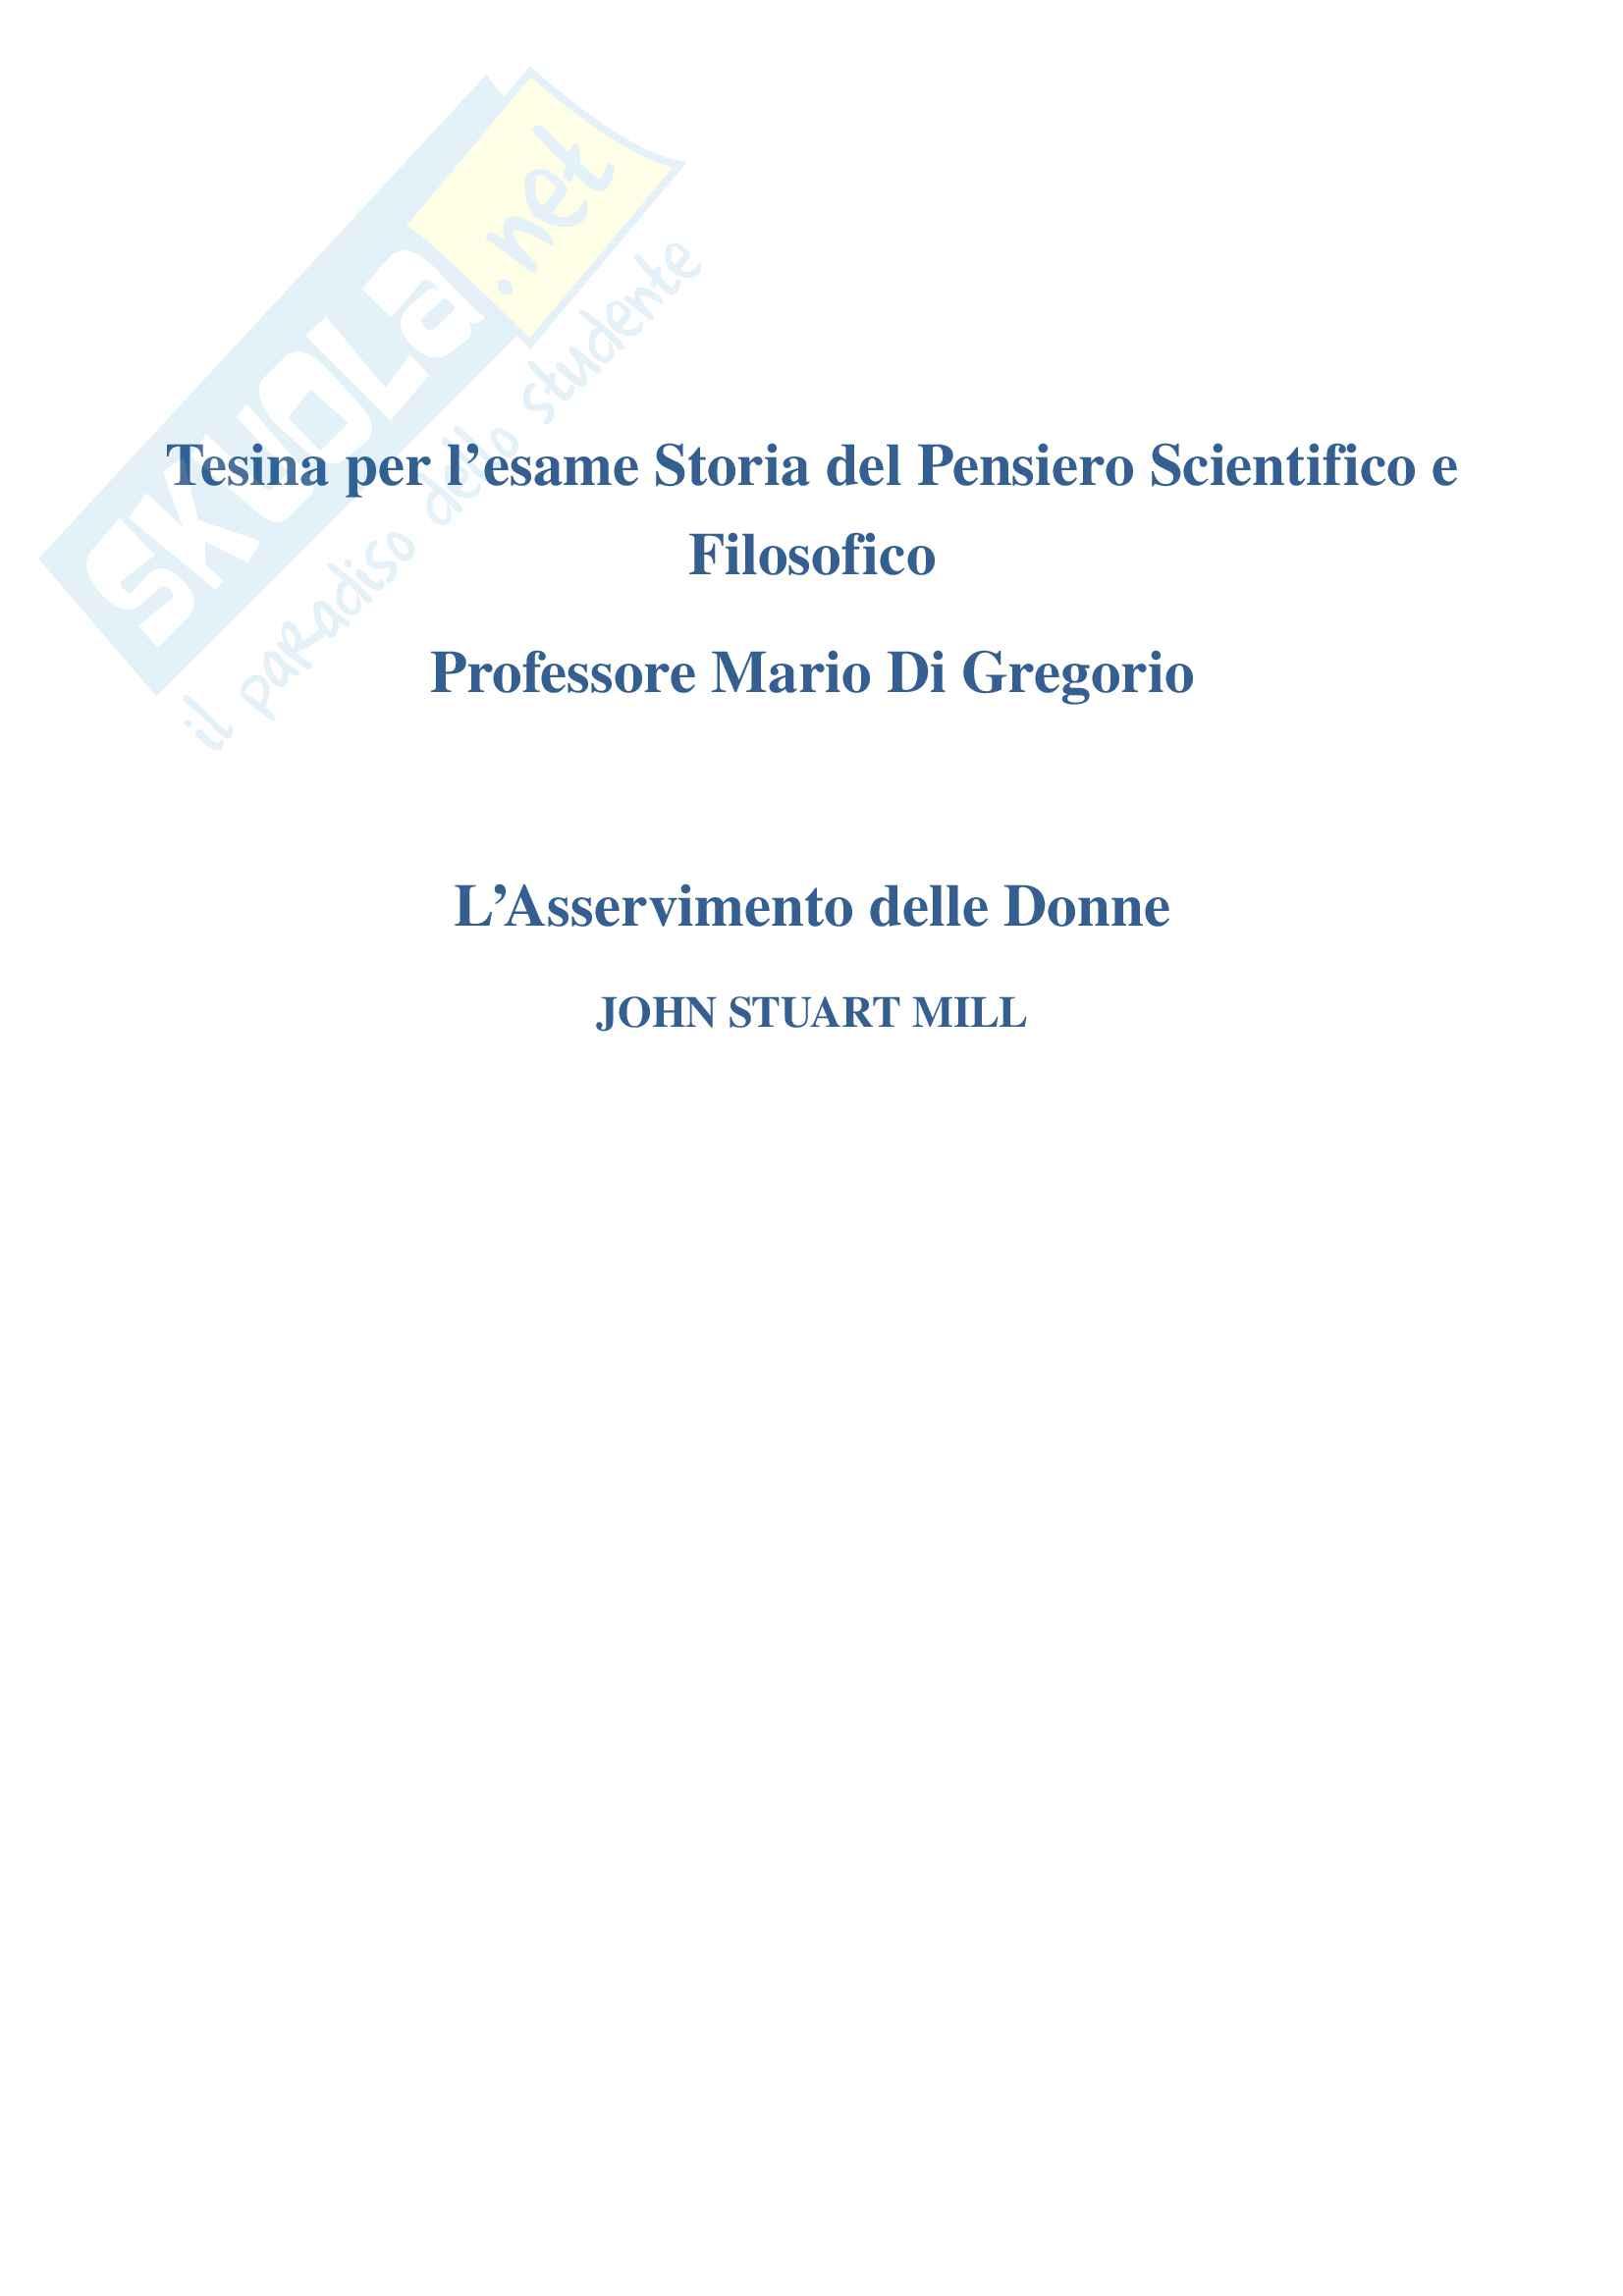 Tesina esame Prof. Di Gregorio, John Stuart Mill - L'Asservimento delle Donne